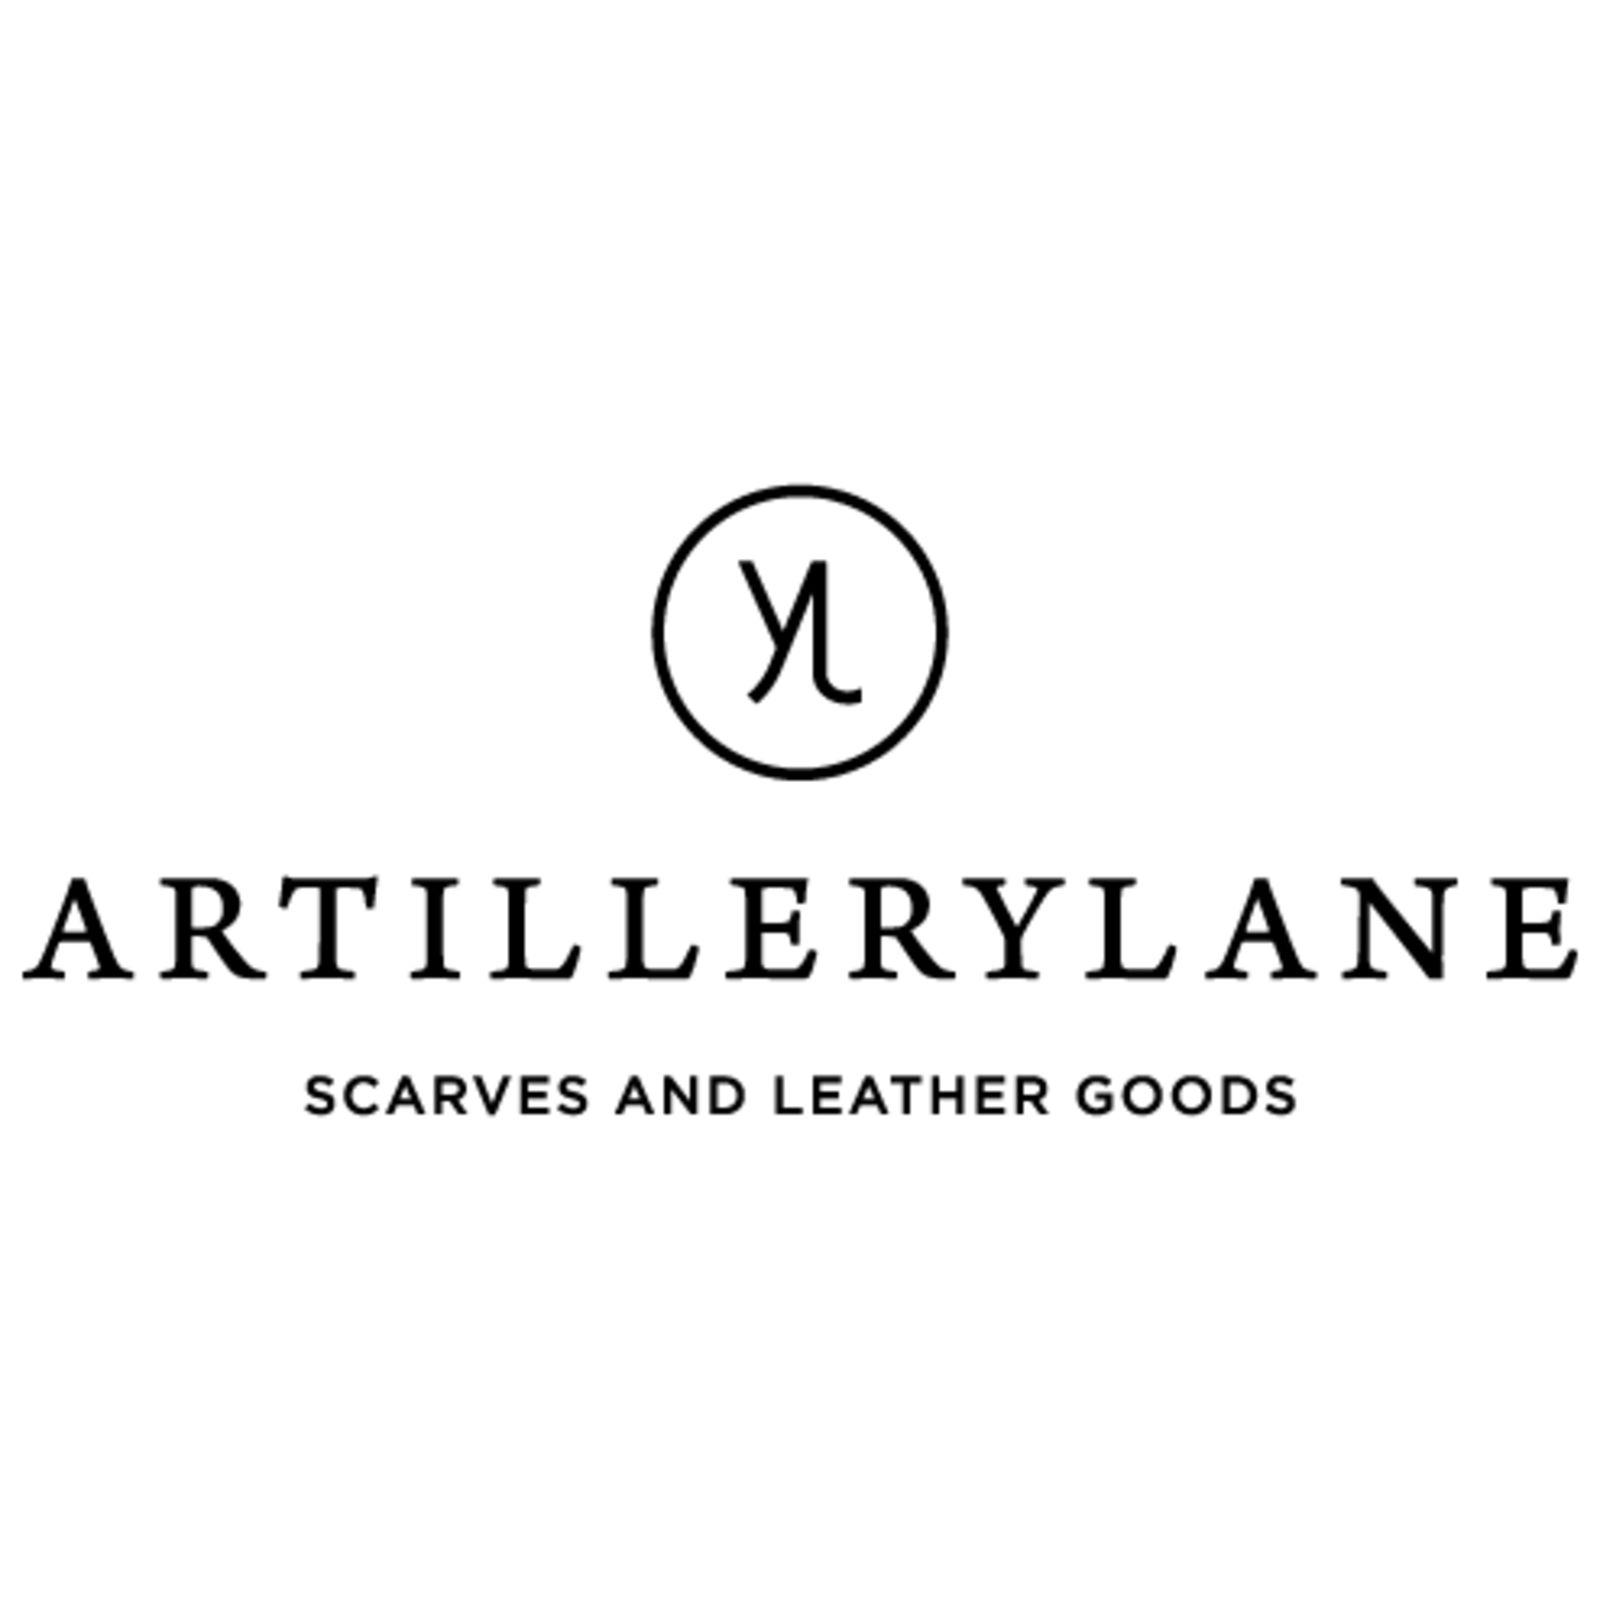 ARTILLERYLANE